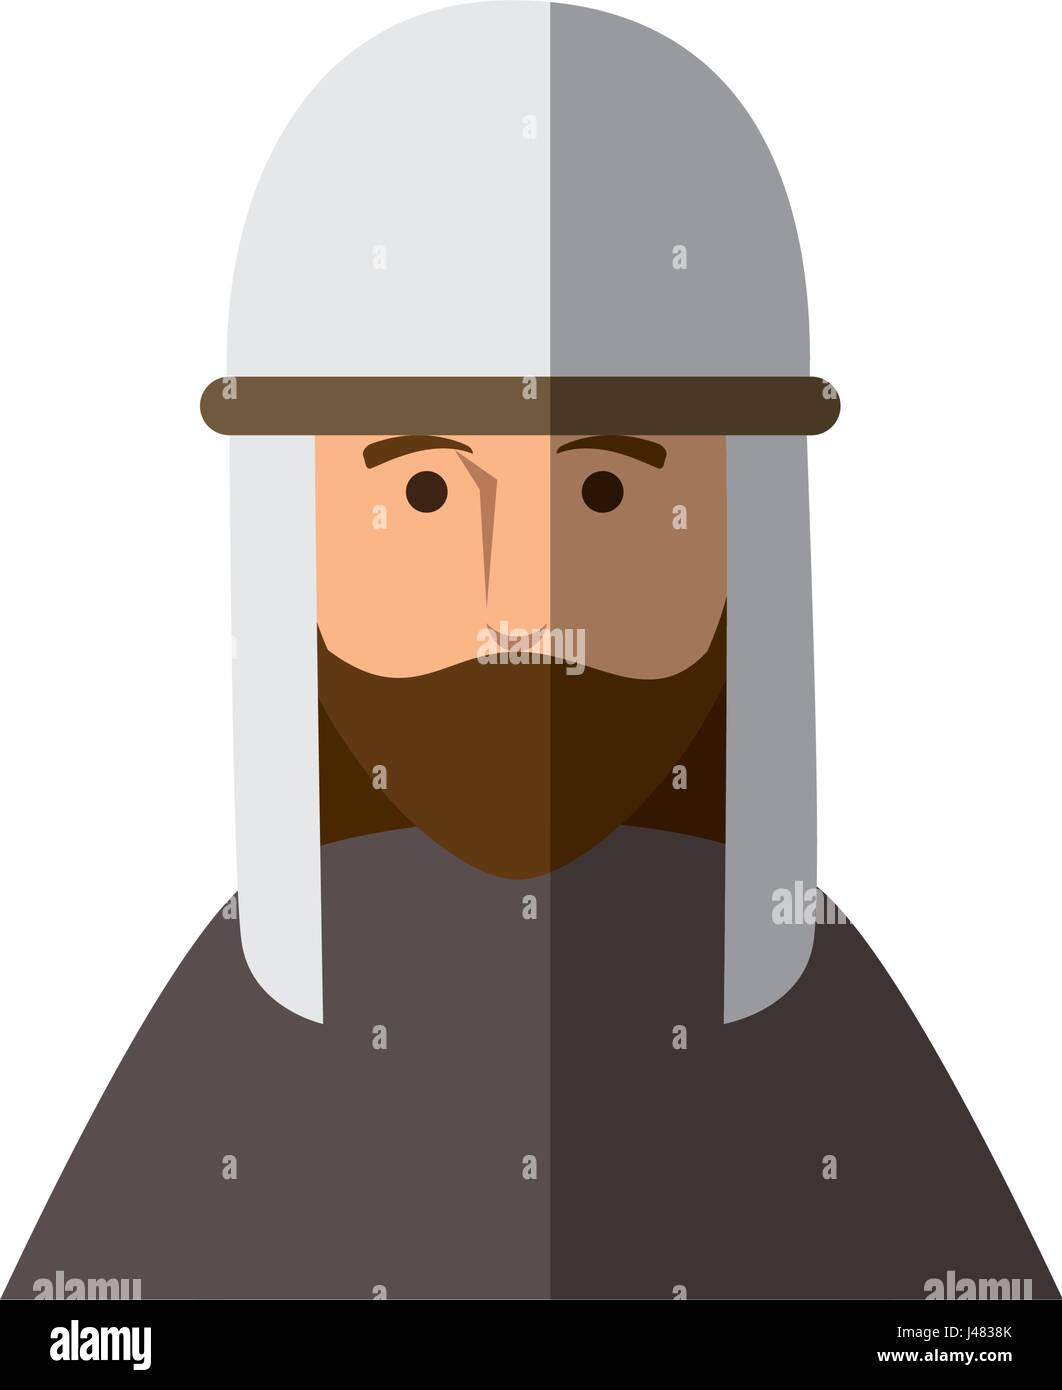 jesus christ man icon - Stock Image